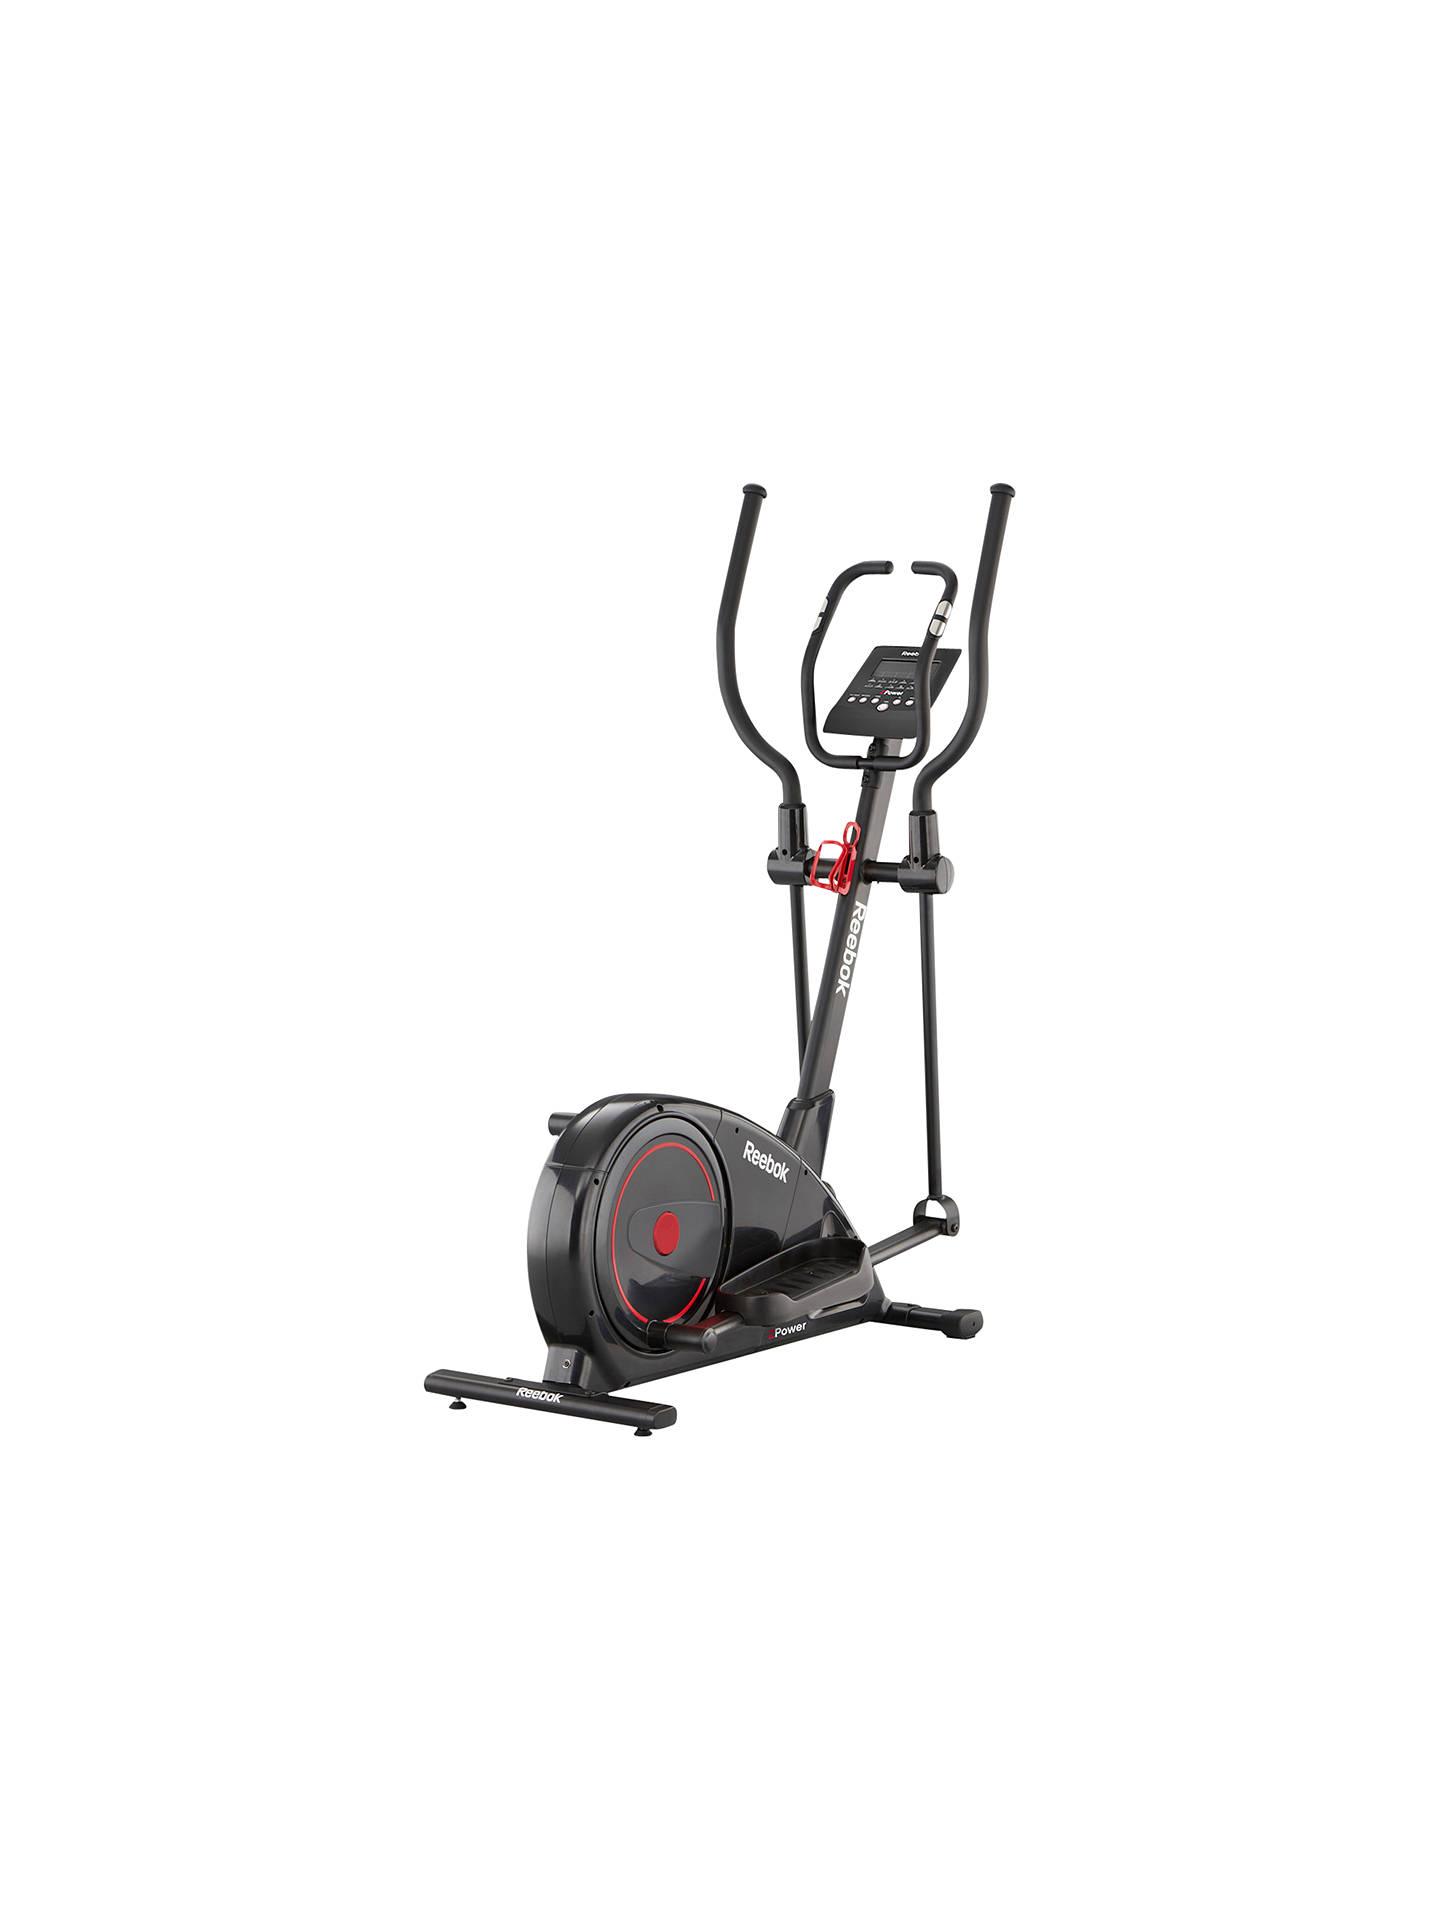 92d9860b1d3c2c Buy Reebok Z-Power Cross Trainer, Black Online at johnlewis.com ...